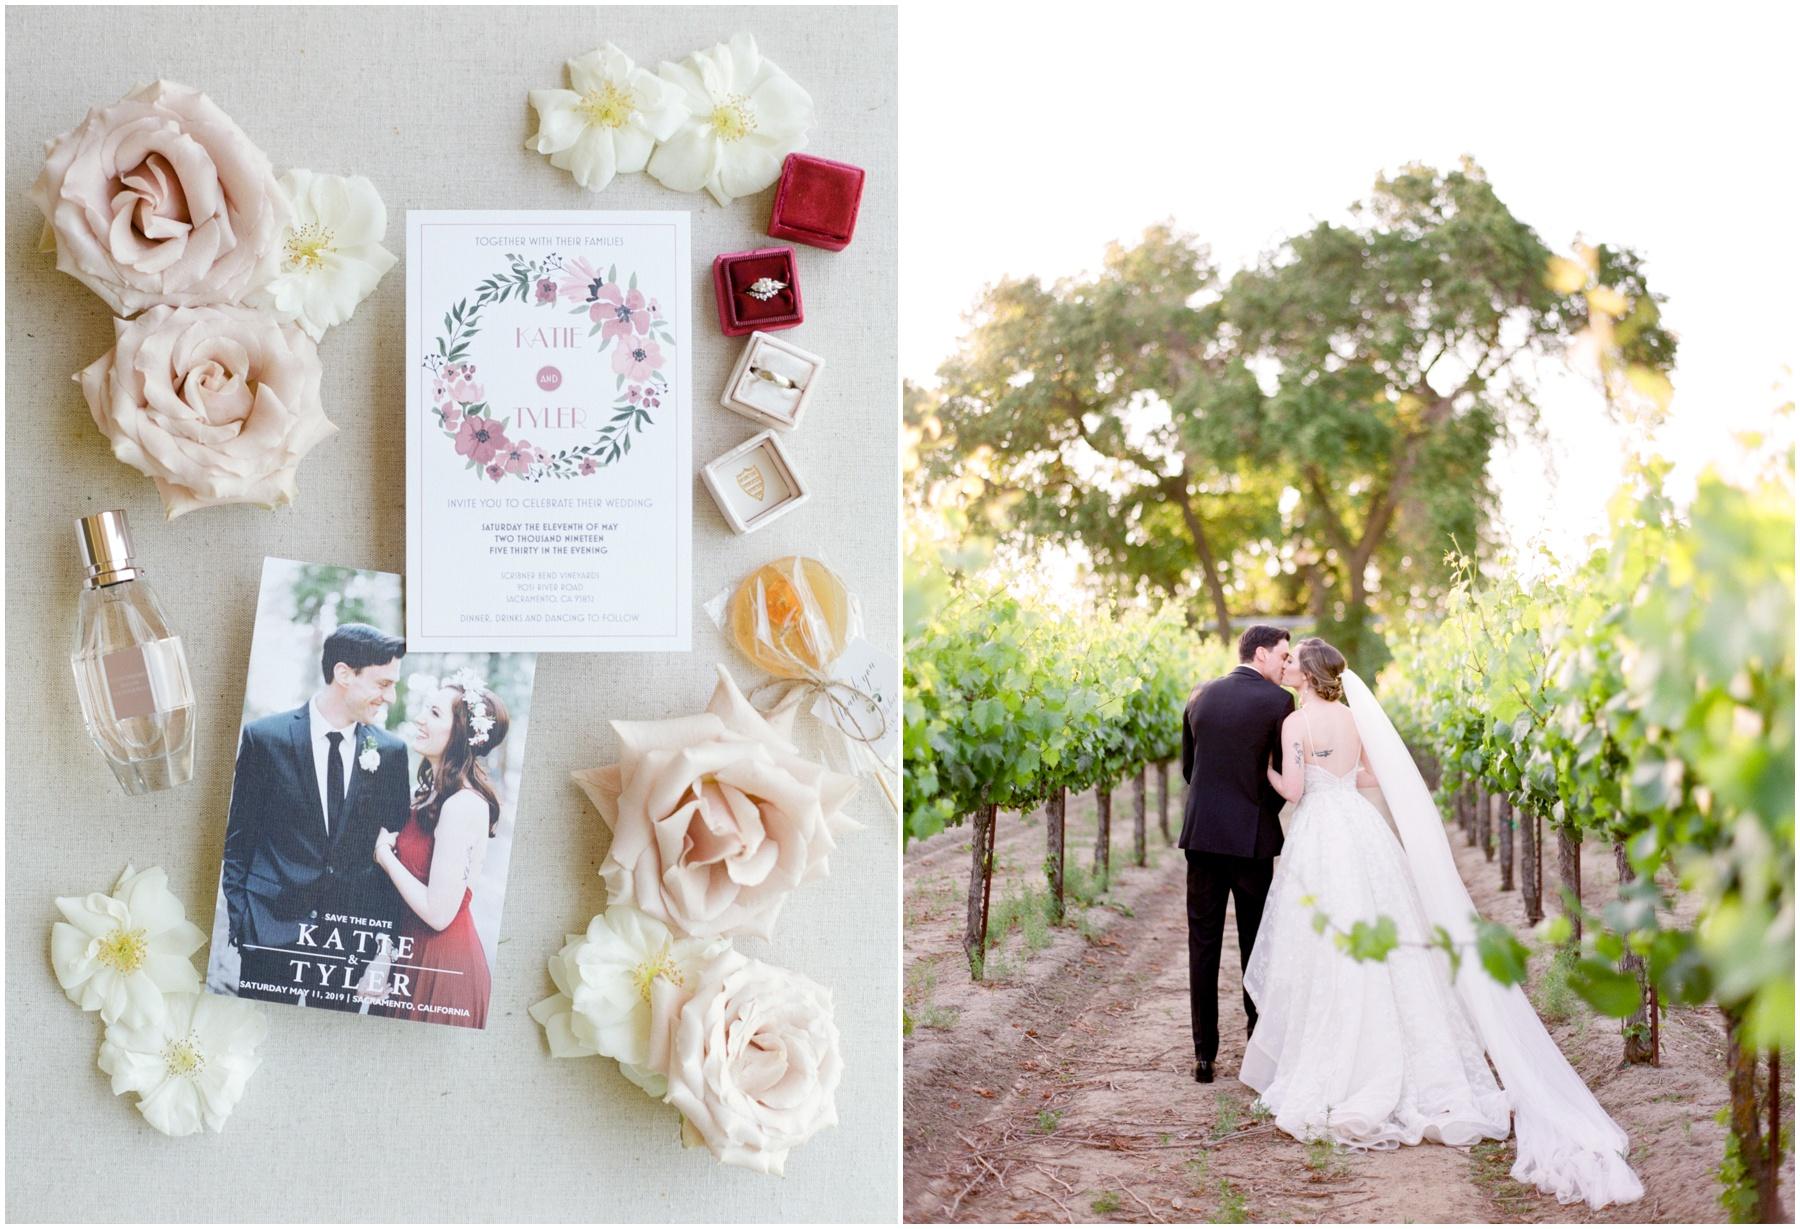 Scribner-bend-vineyards-wedding-sacramento-california-Kristine-Herman-Photography-113.jpg